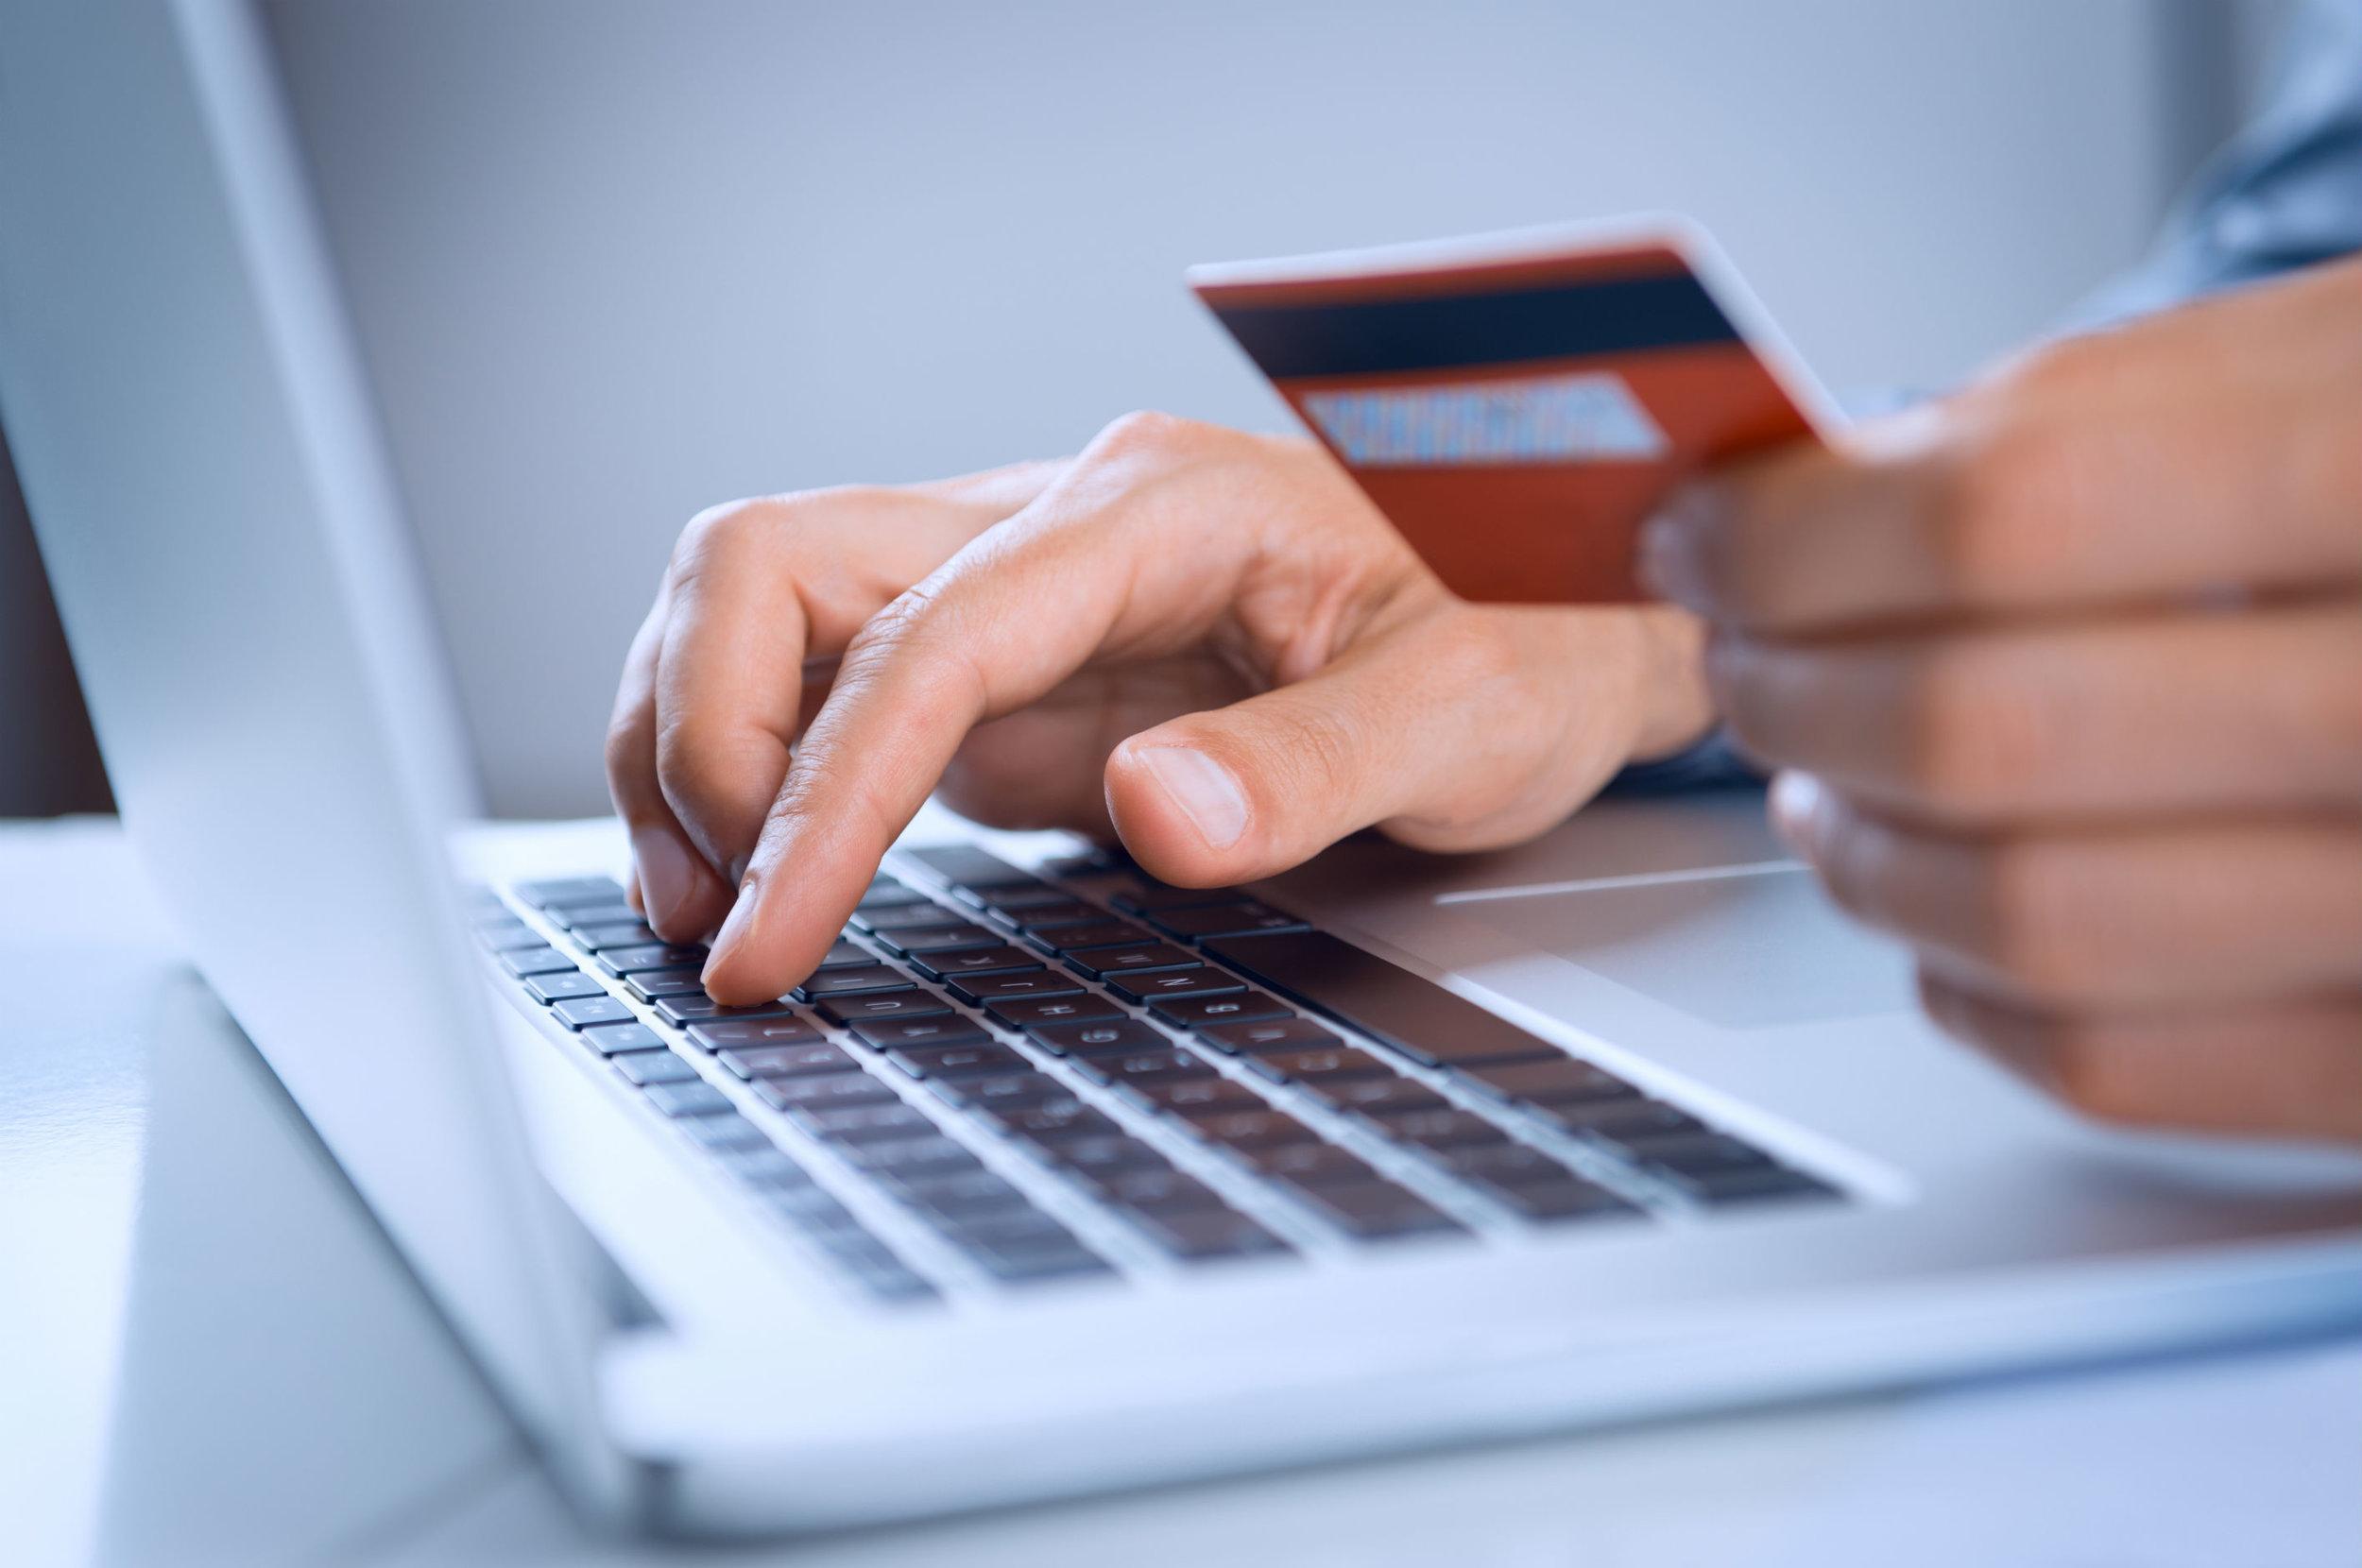 make-payment-online.jpg